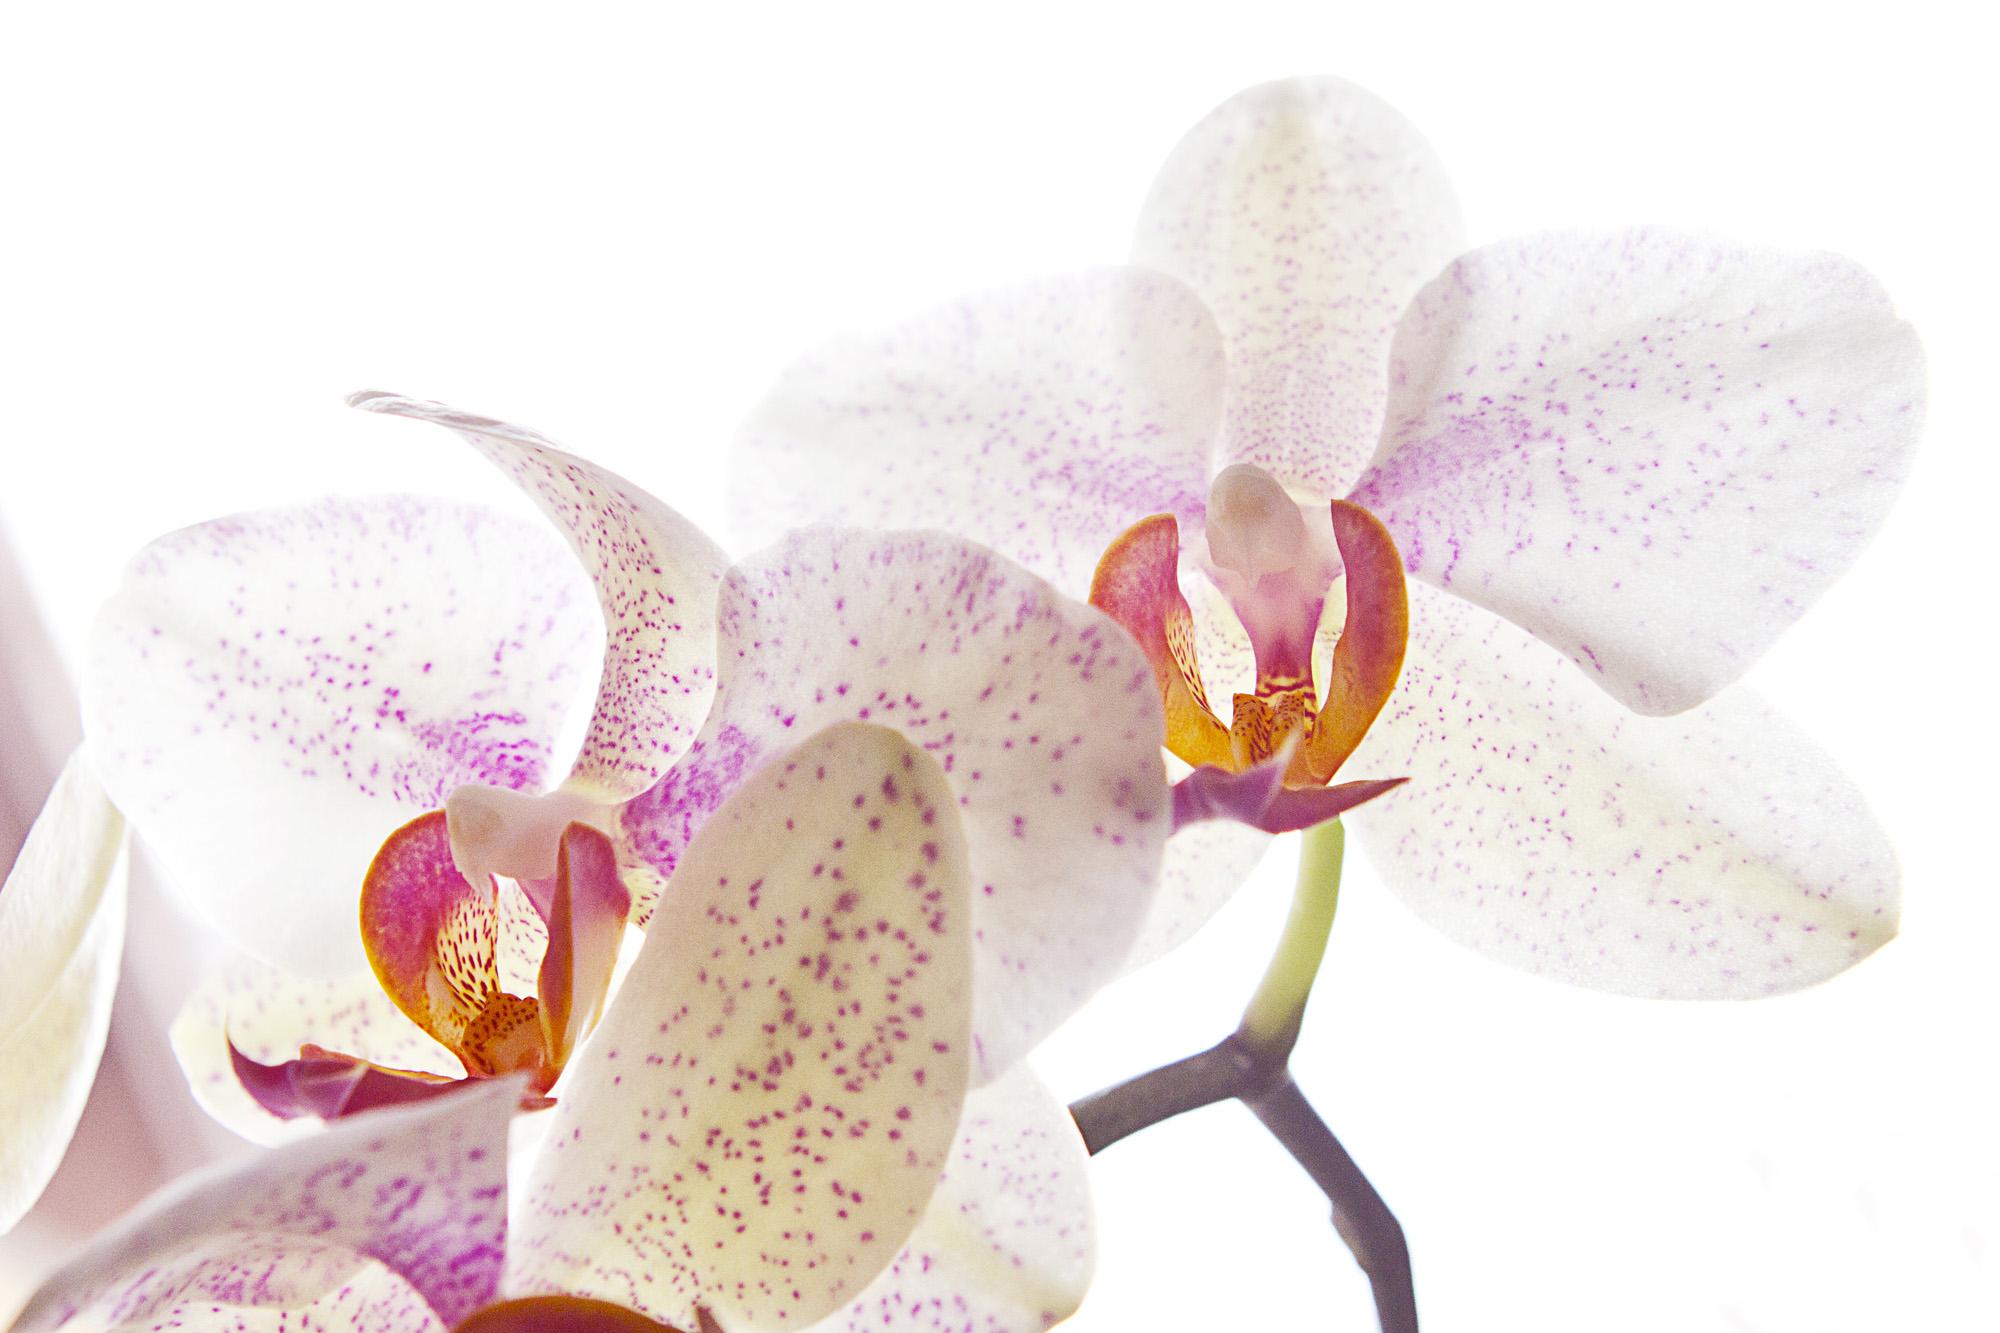 orchidee verbl ht orchidee eigenartige dendrobium luftwurzeln pflanzen orchideen der gr ne. Black Bedroom Furniture Sets. Home Design Ideas